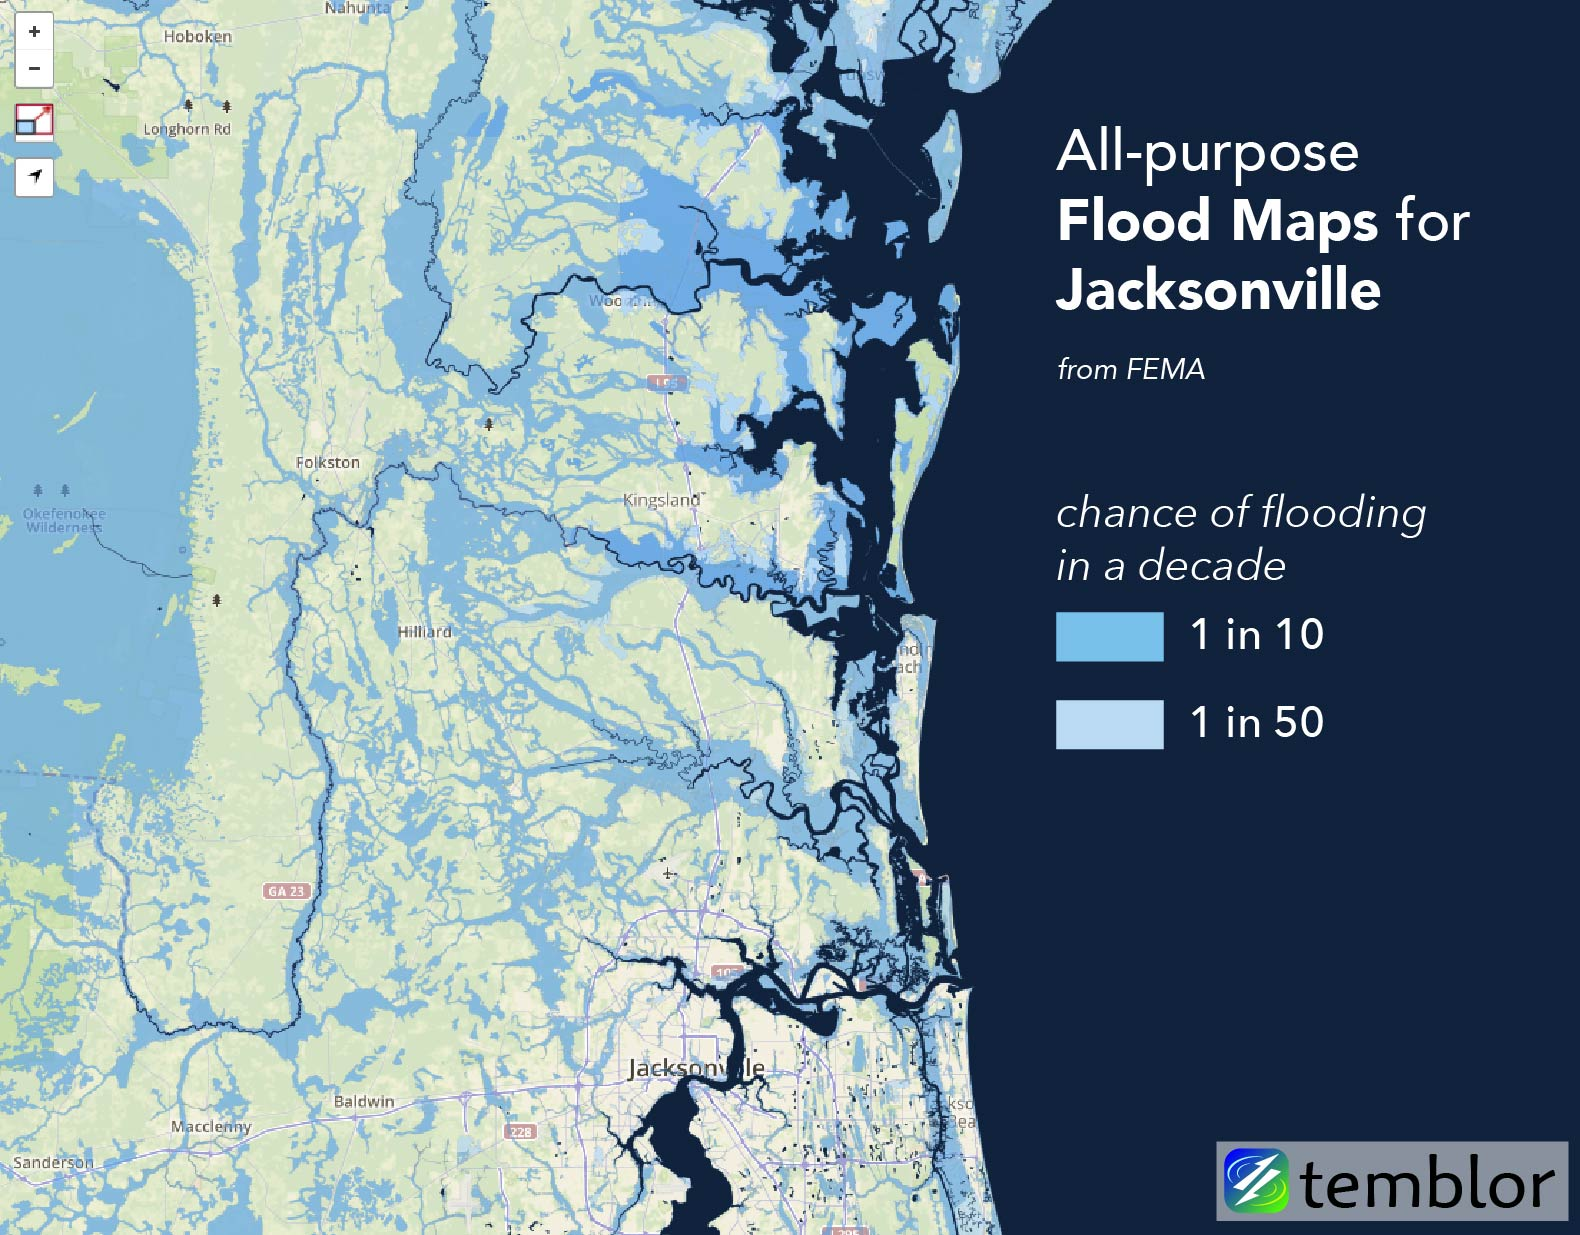 General FEMA flood map for Jacksonville, Florida.